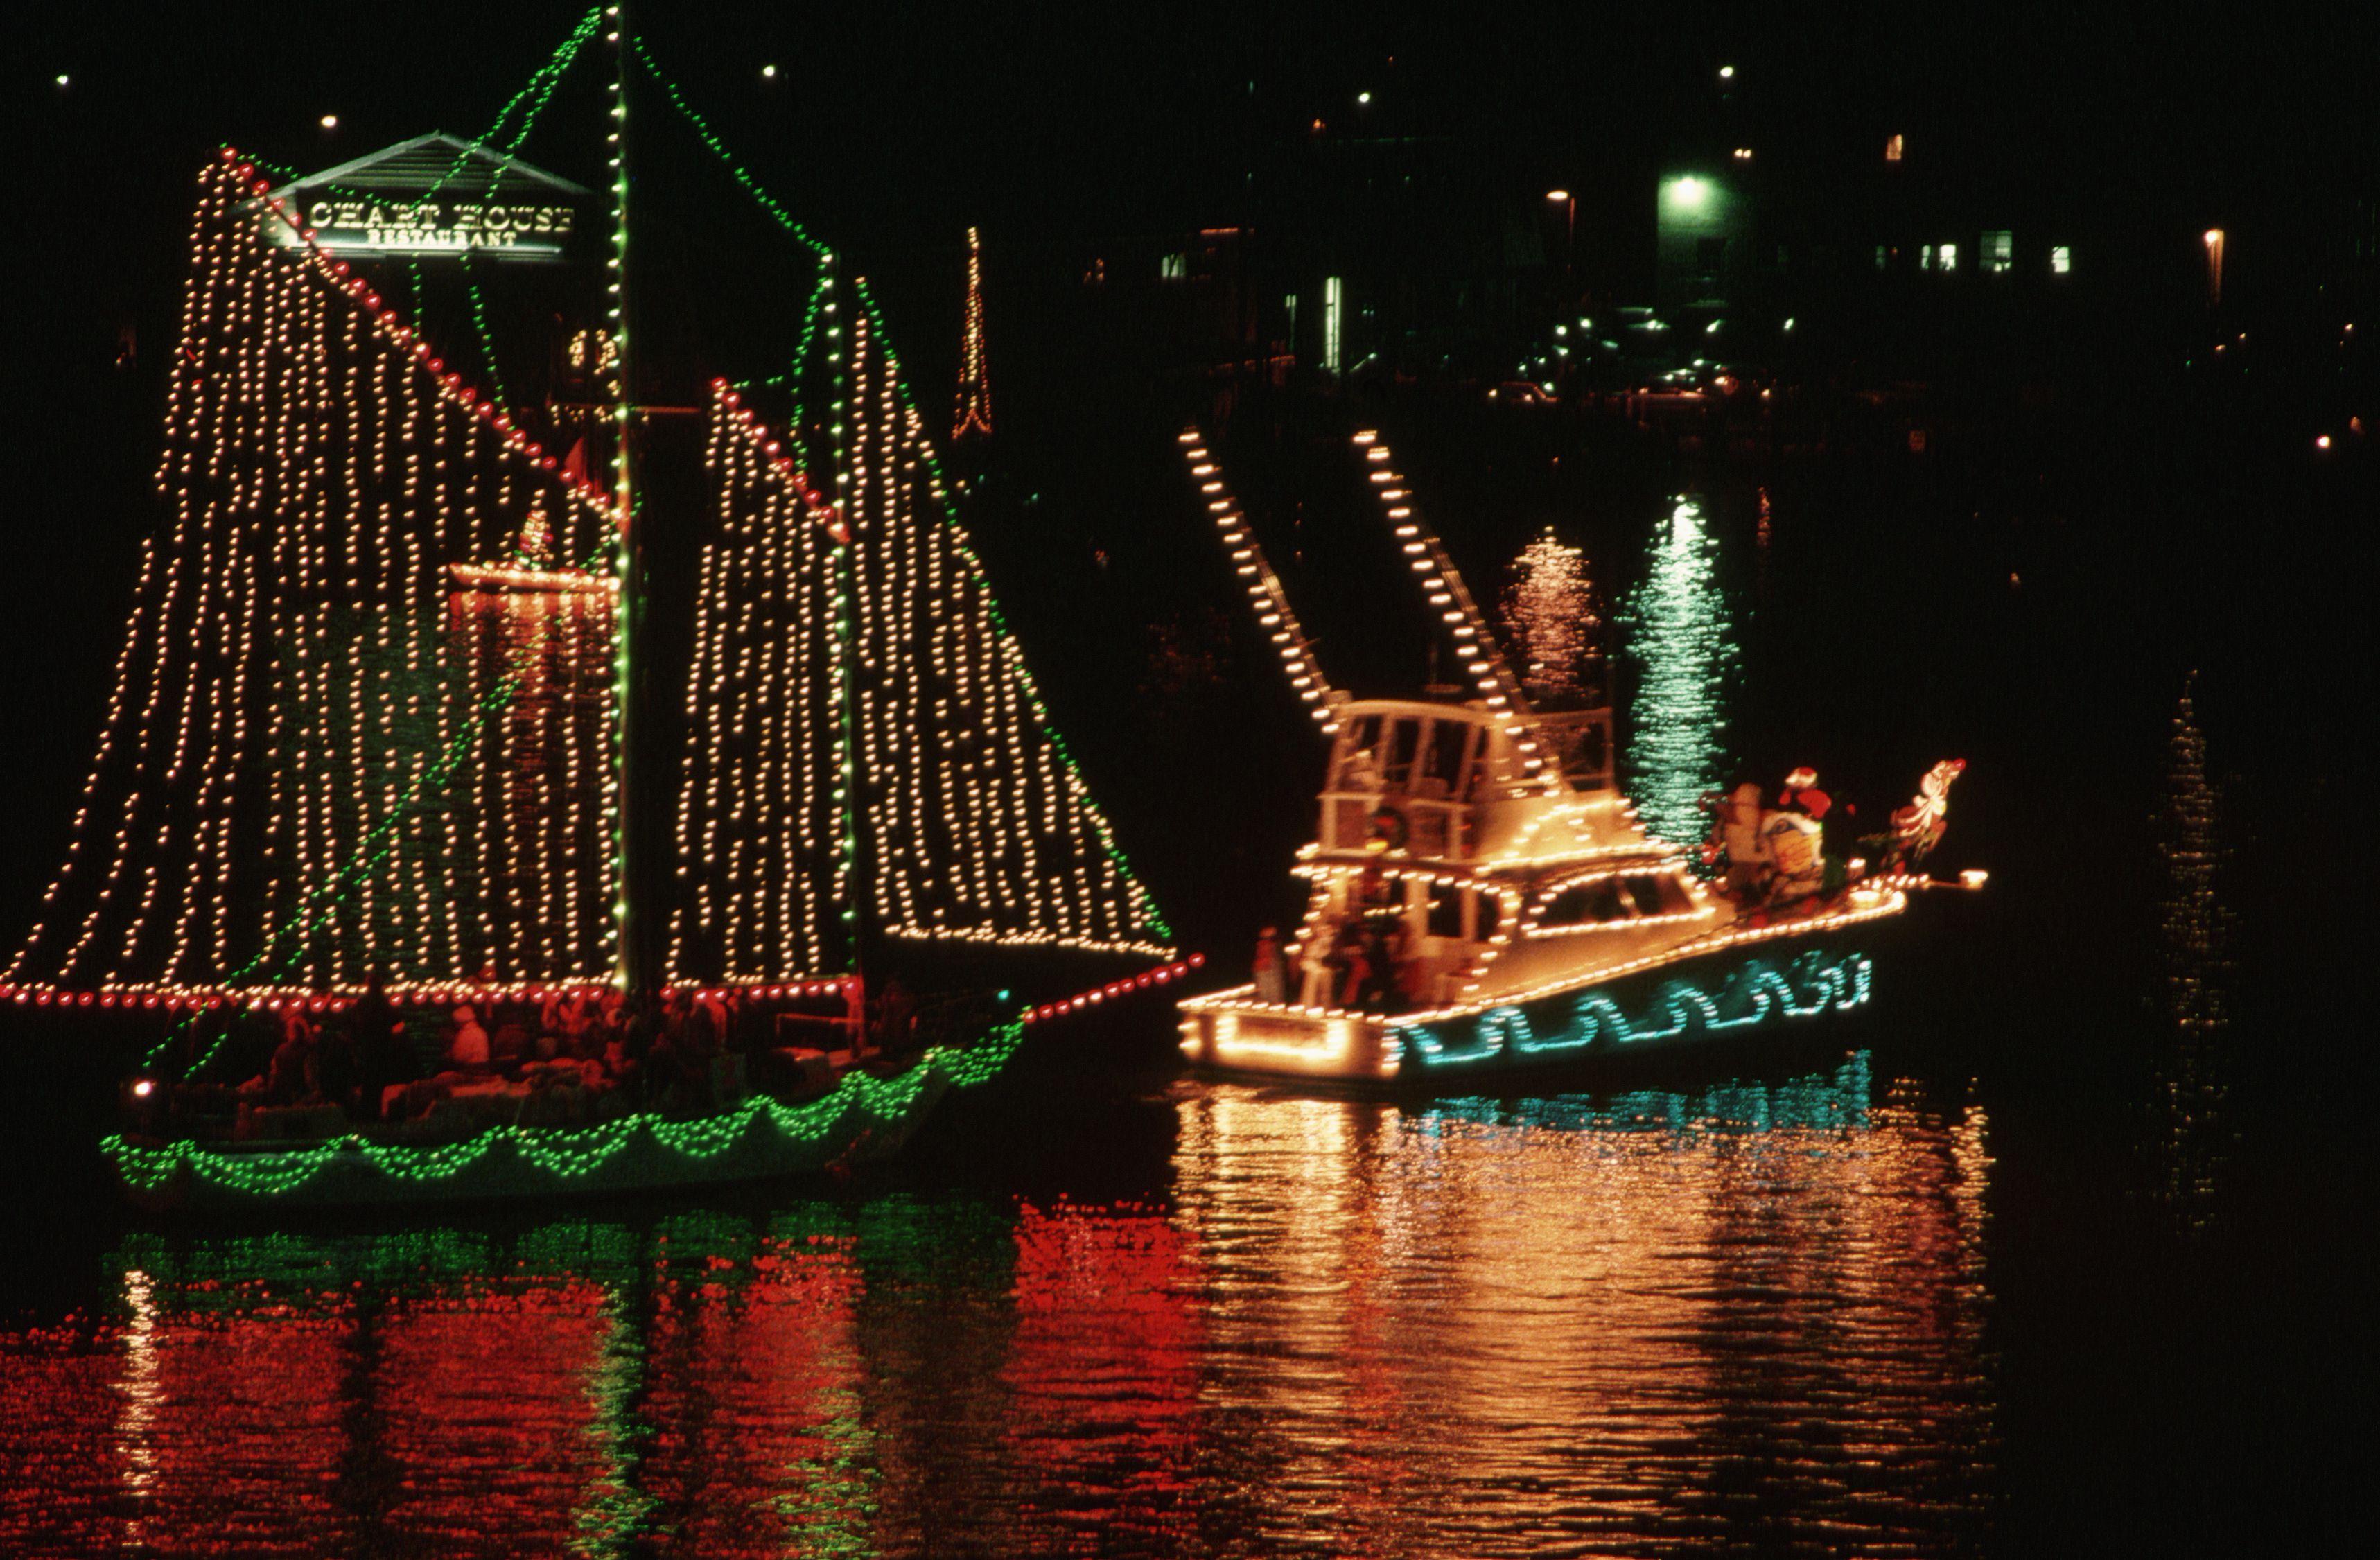 Annapolis Christmas Boat Parade 2020 Annapolis 2018 Christmas Lights, Boat Parades, and Holiday